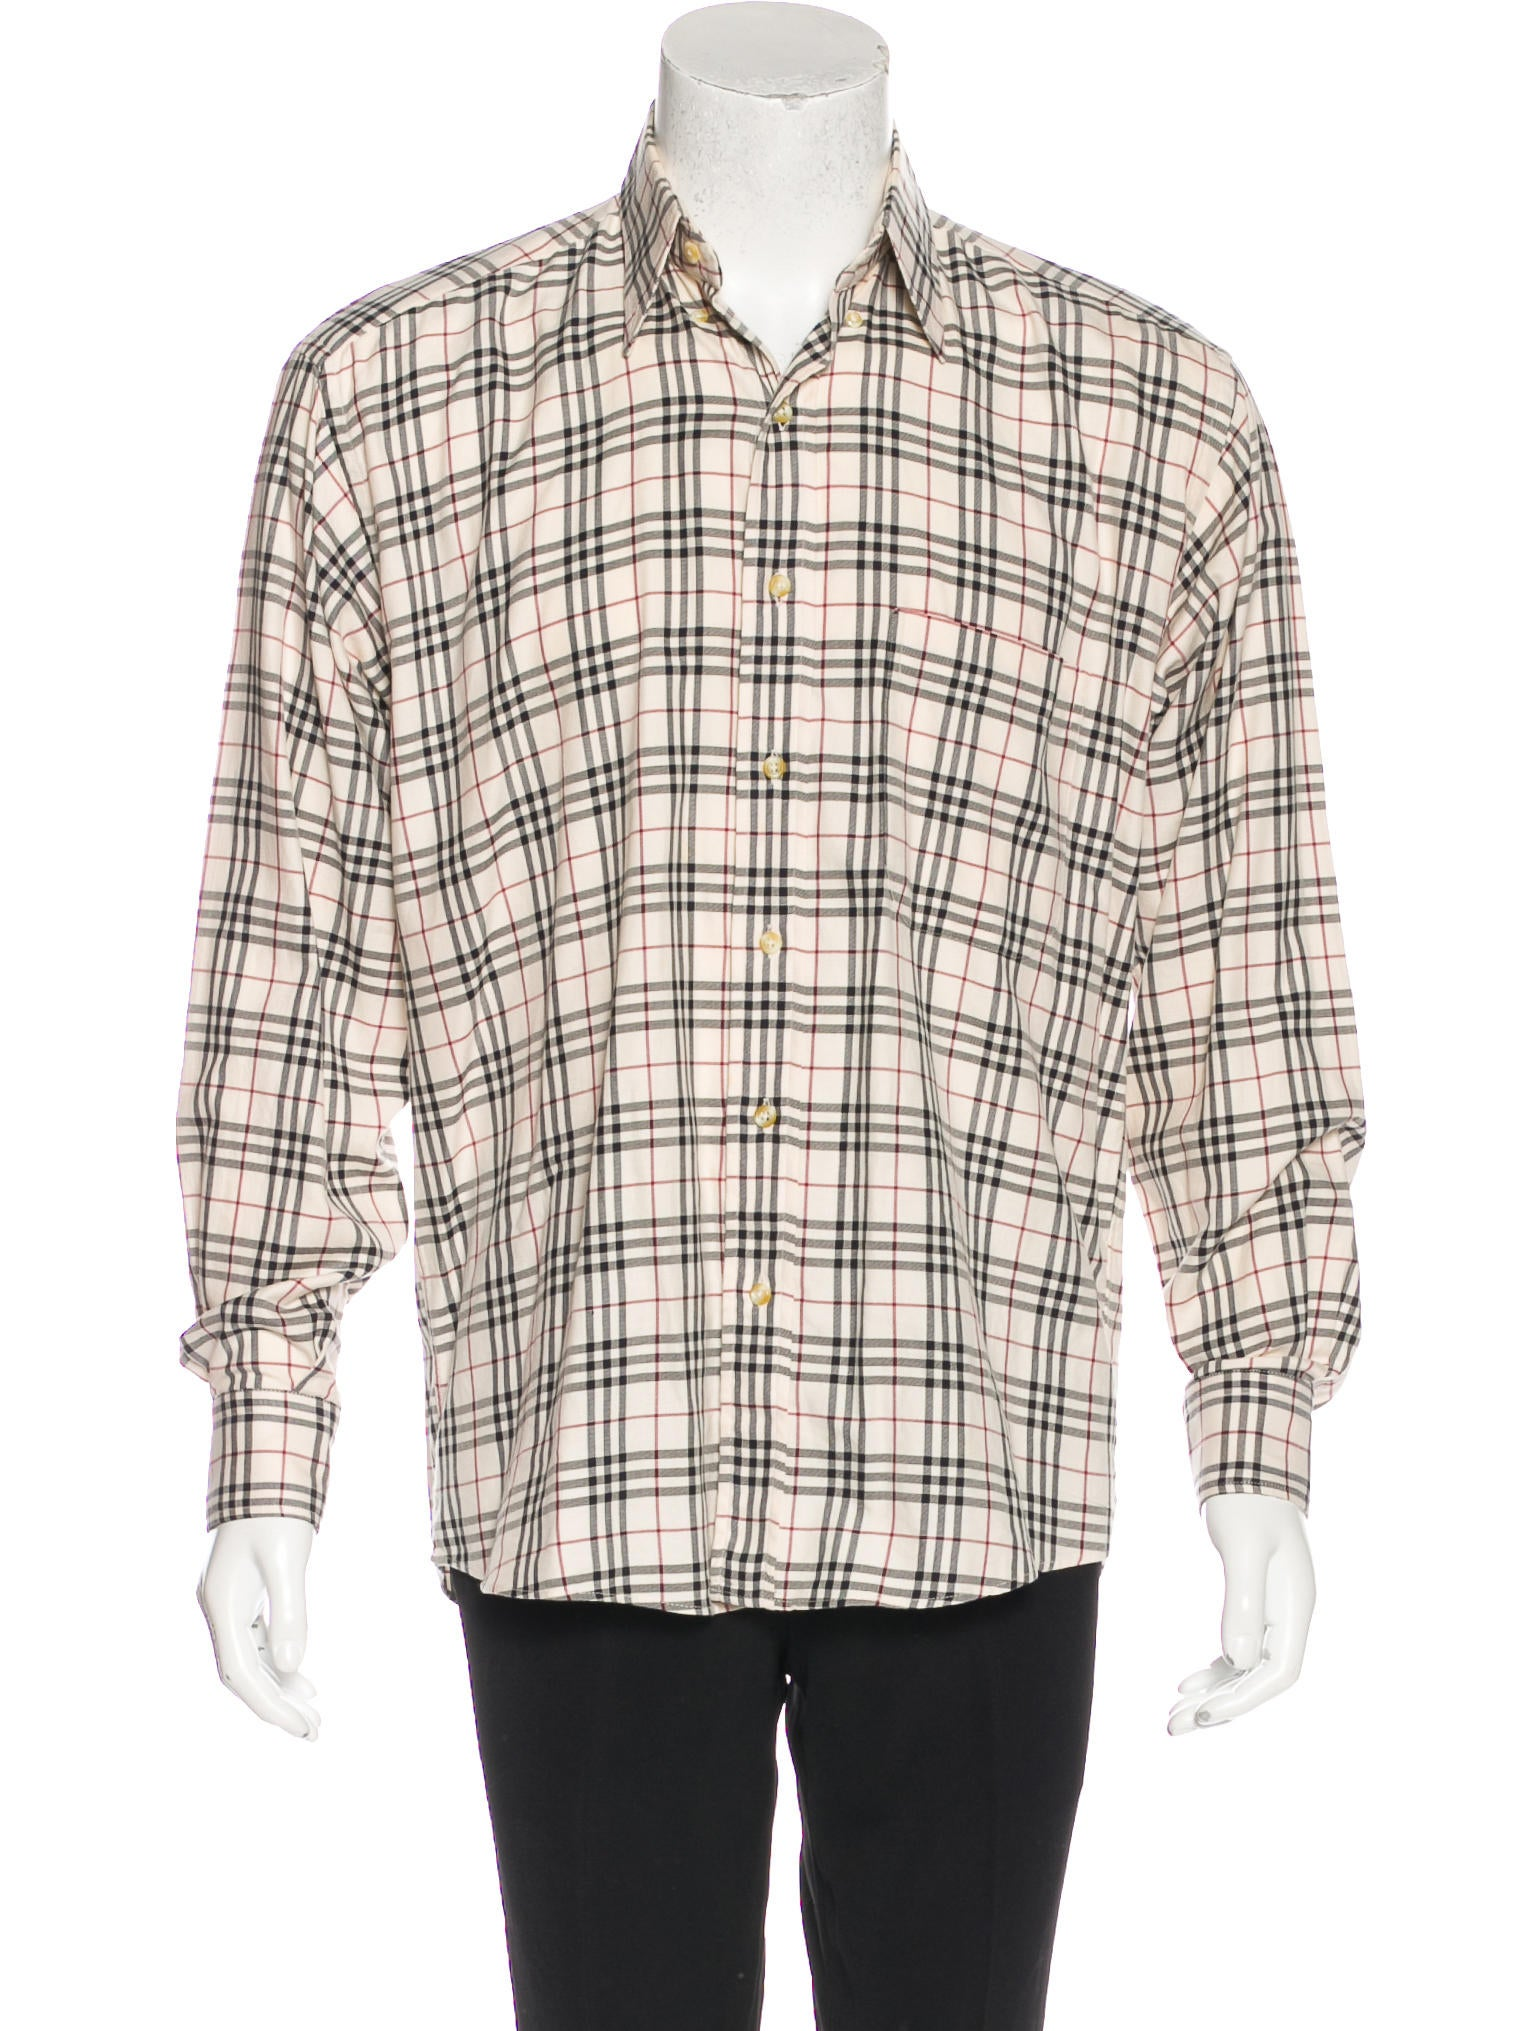 Burberry London Nova Check Shirt Clothing Wburl26247